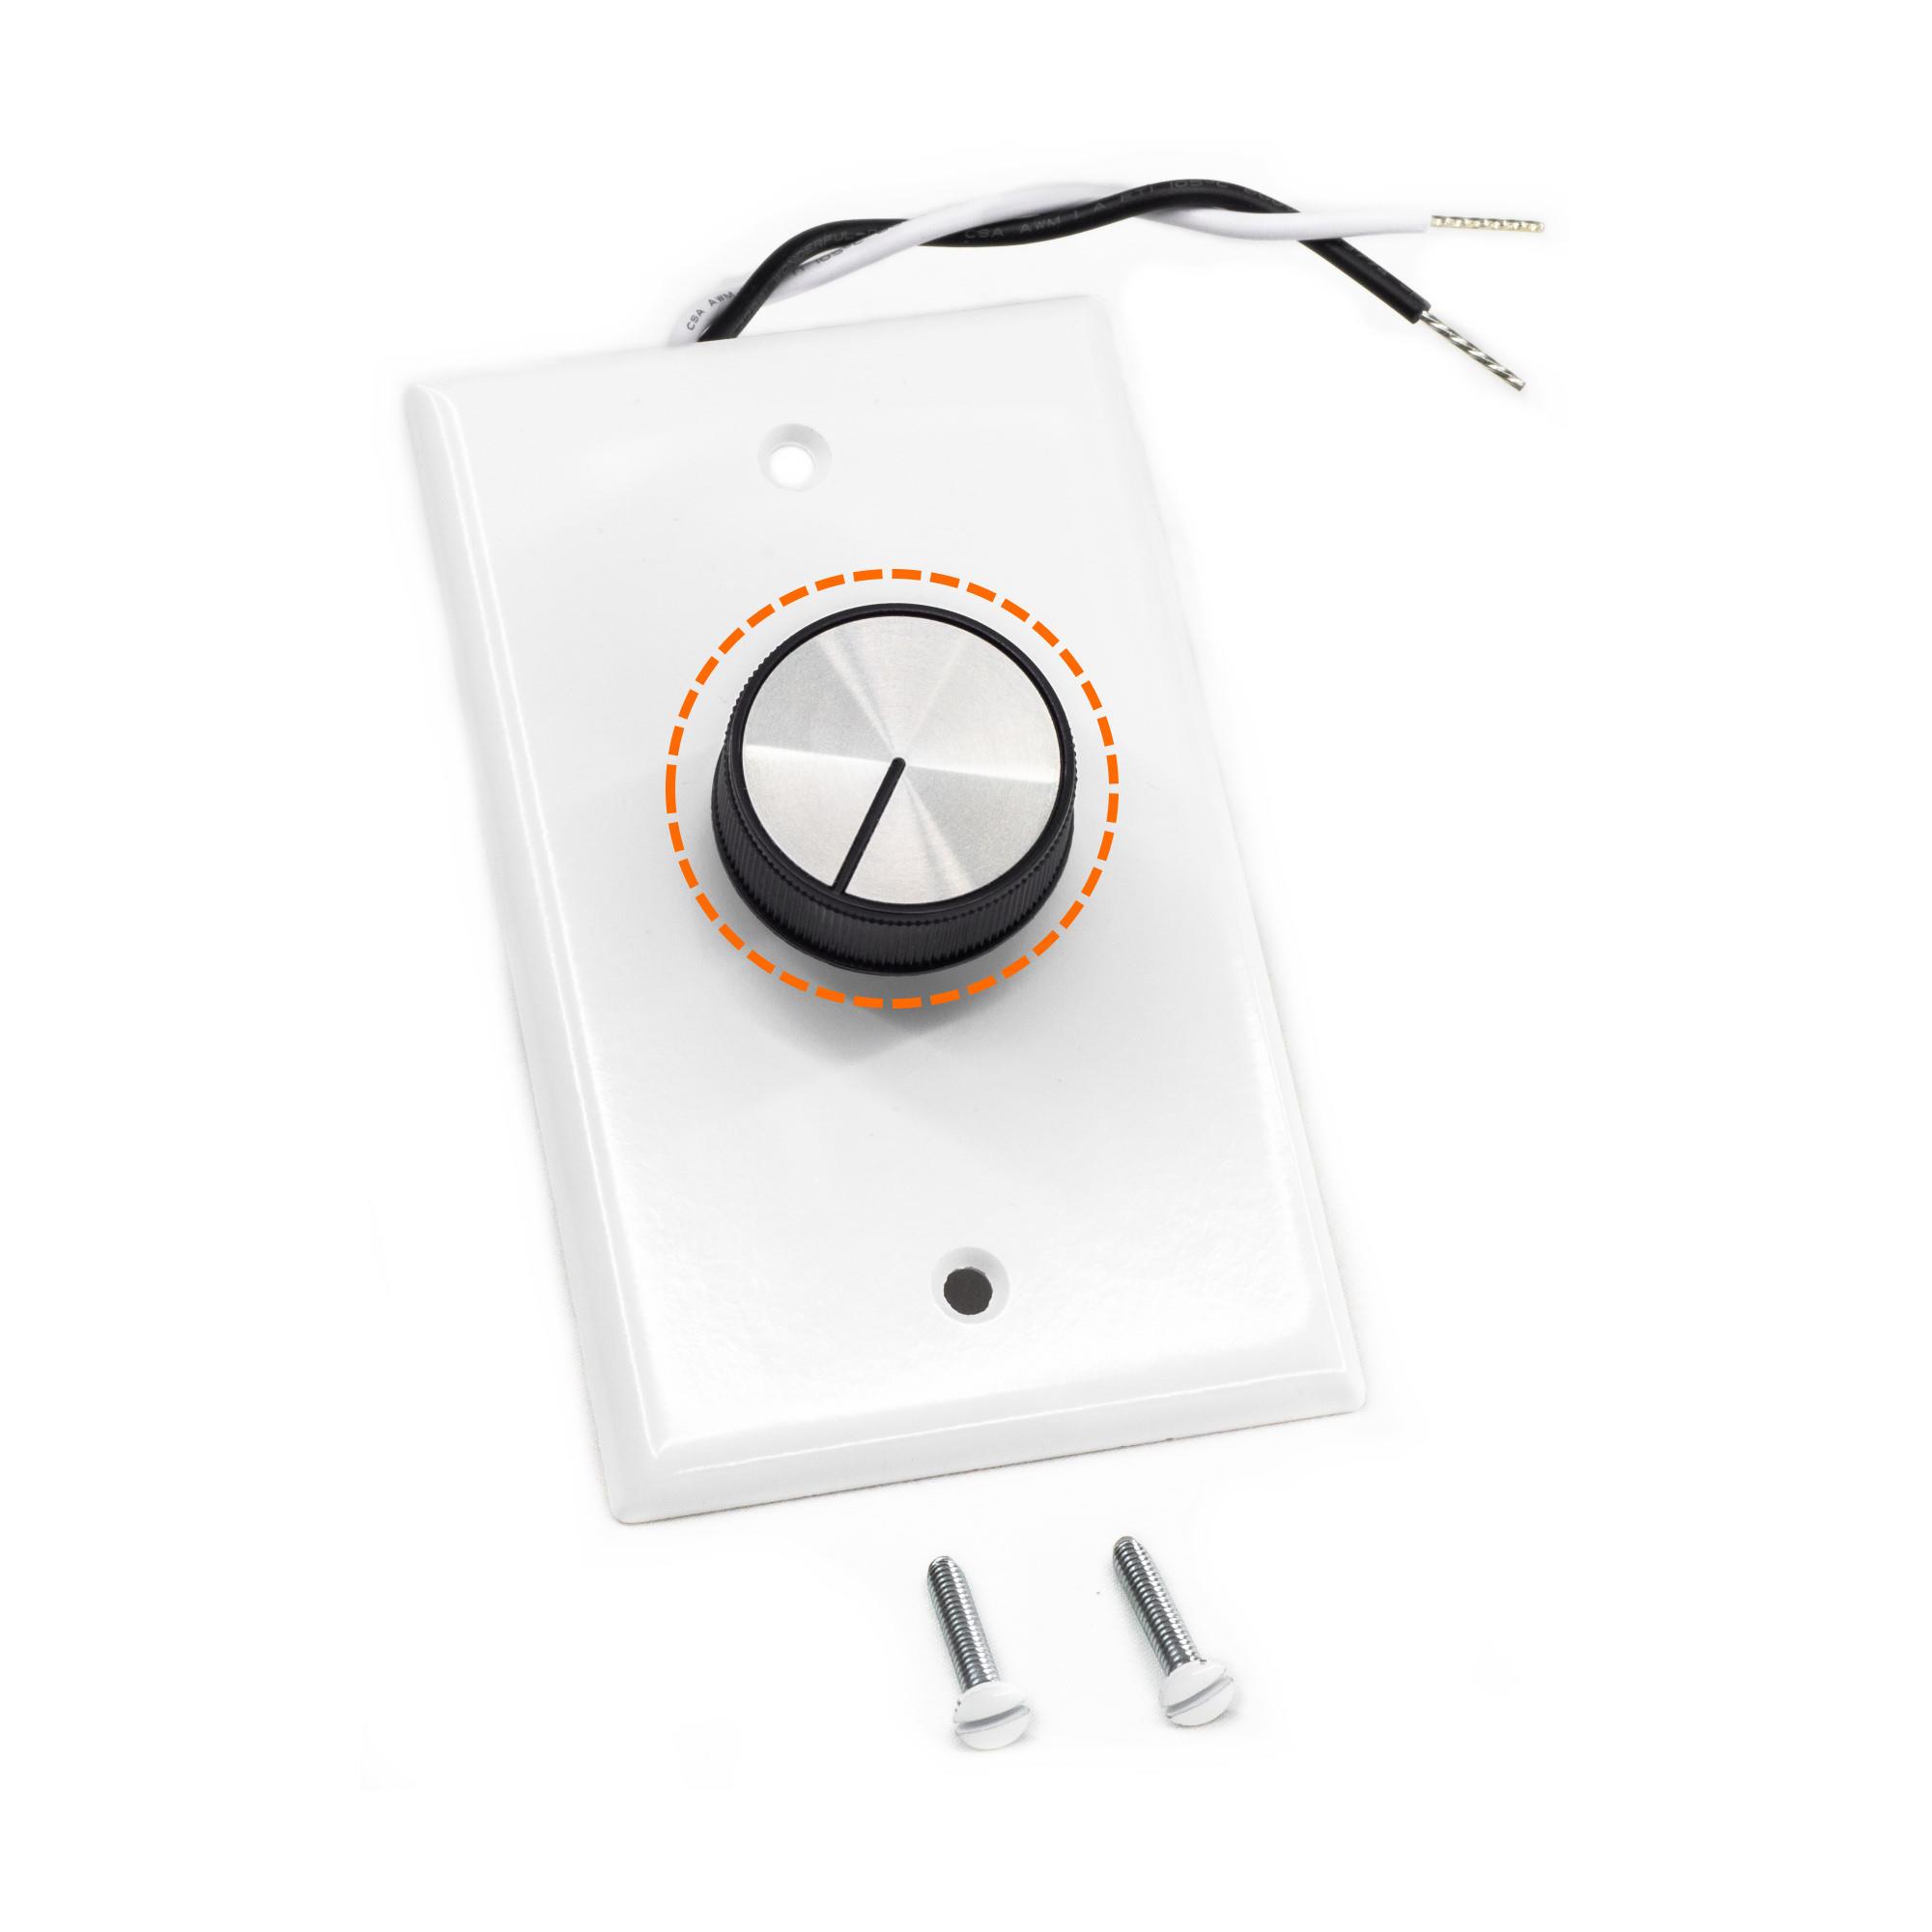 Rheostat Variable Speed Controller Knob (44085)